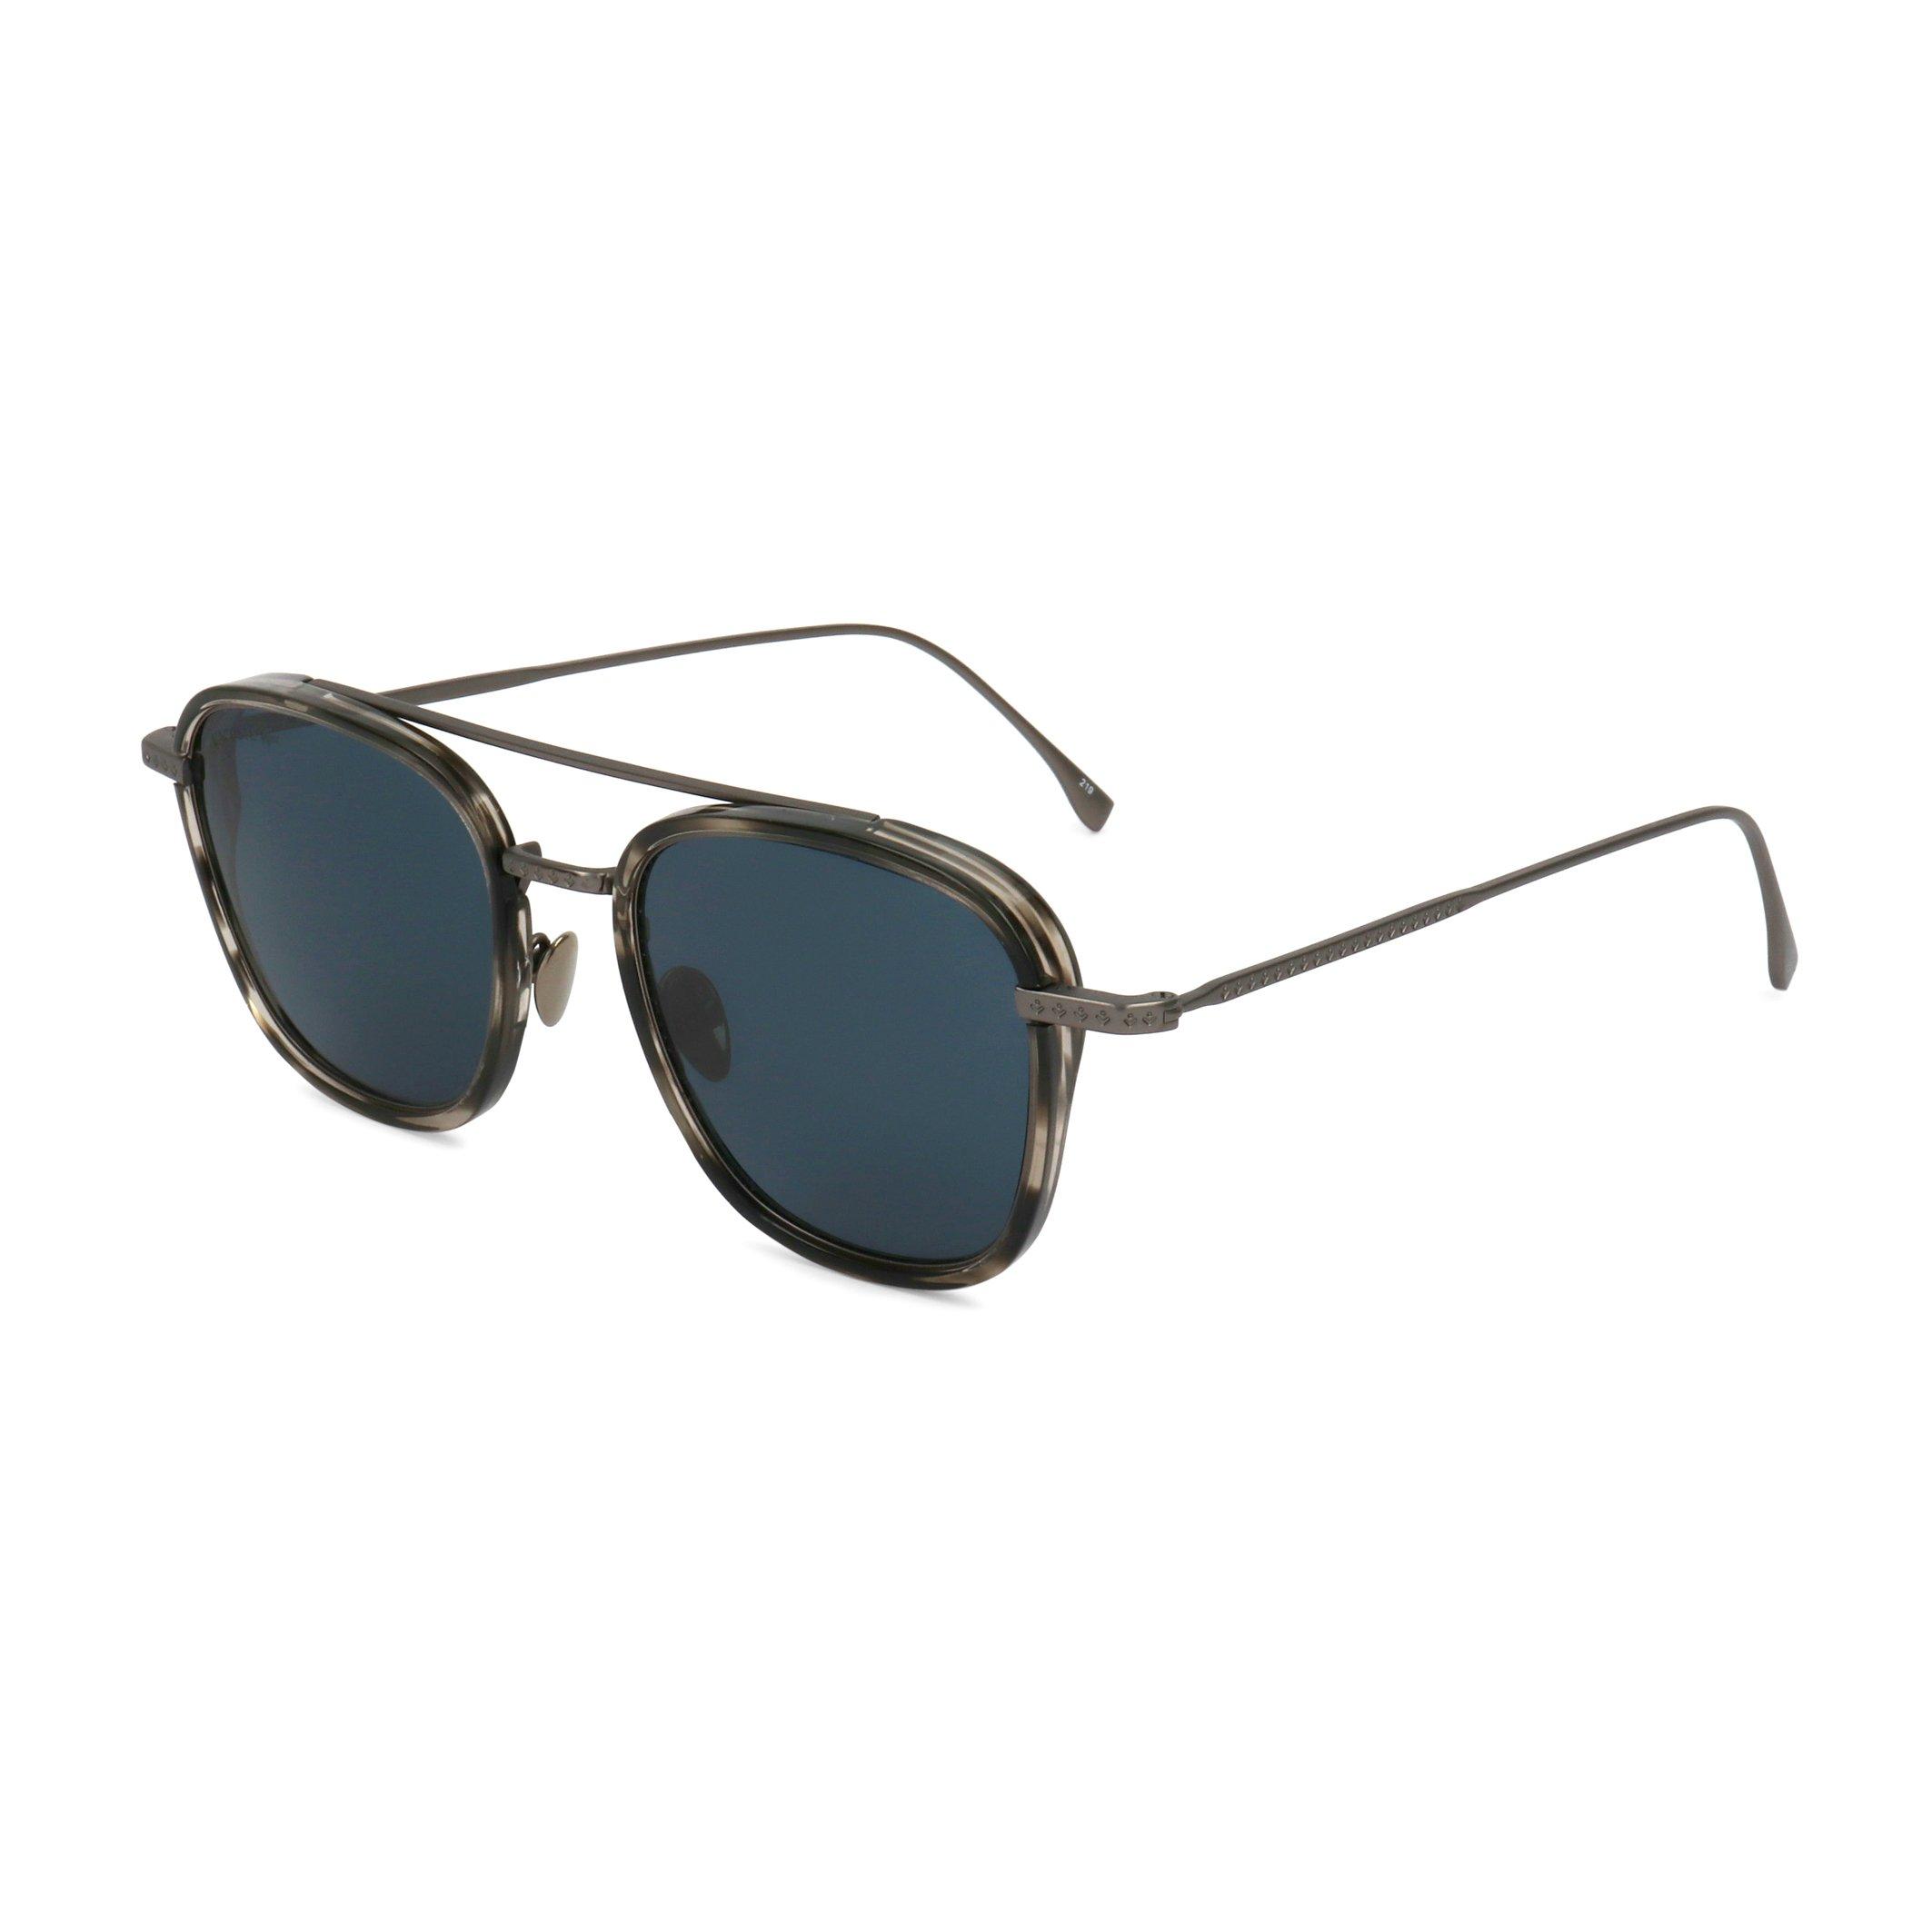 Lacoste Men's Sunglasses Brown L104SND - grey NOSIZE